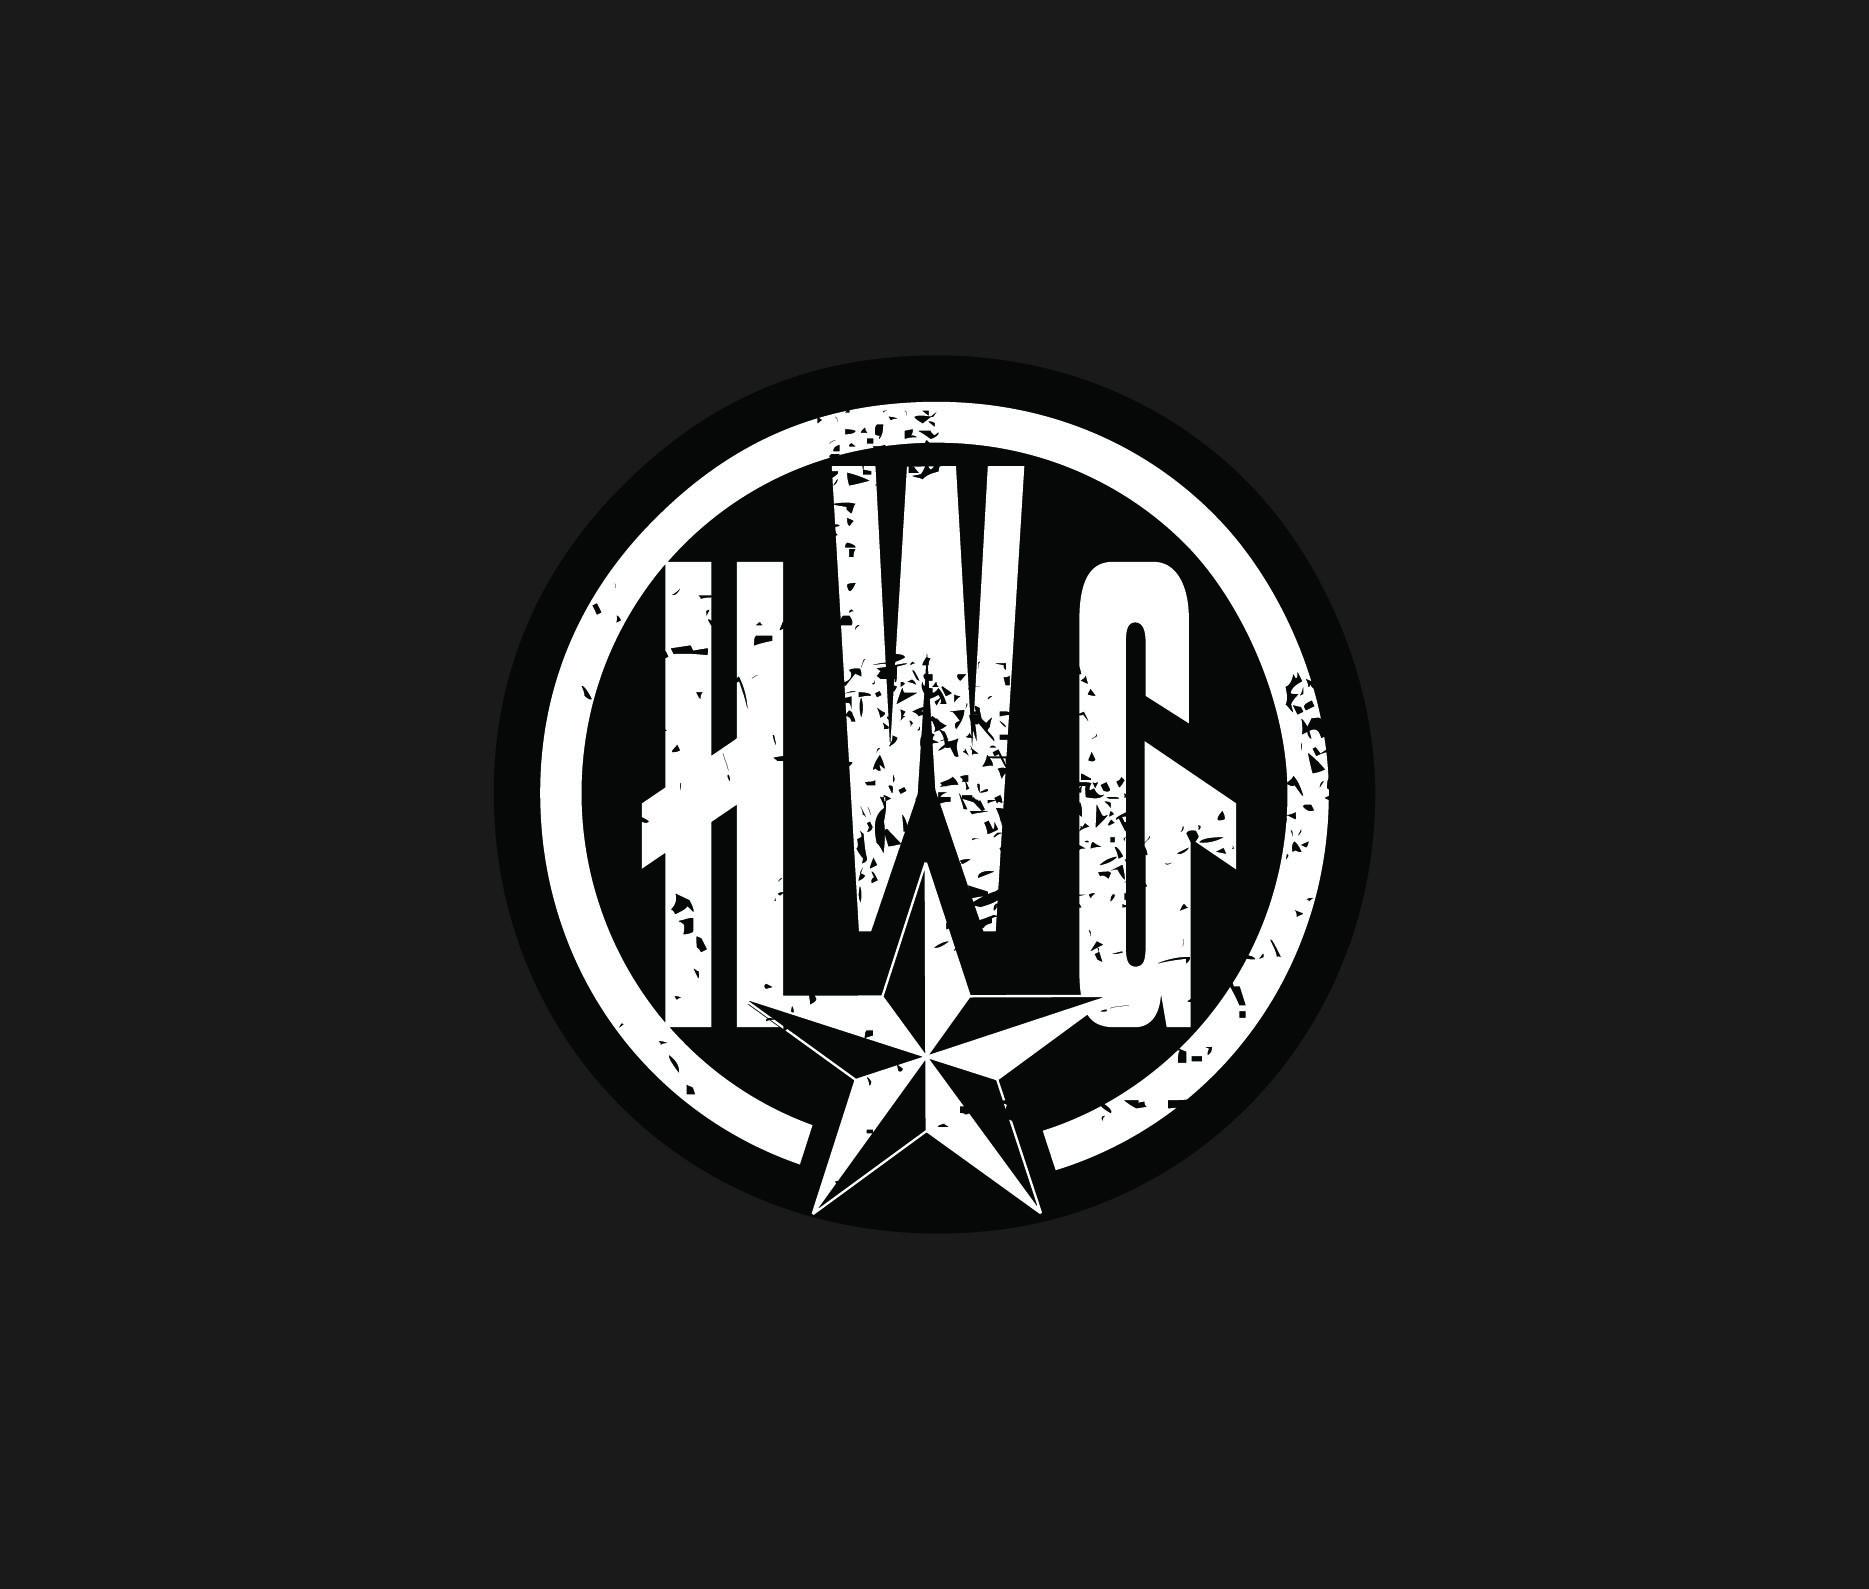 hwgcircle